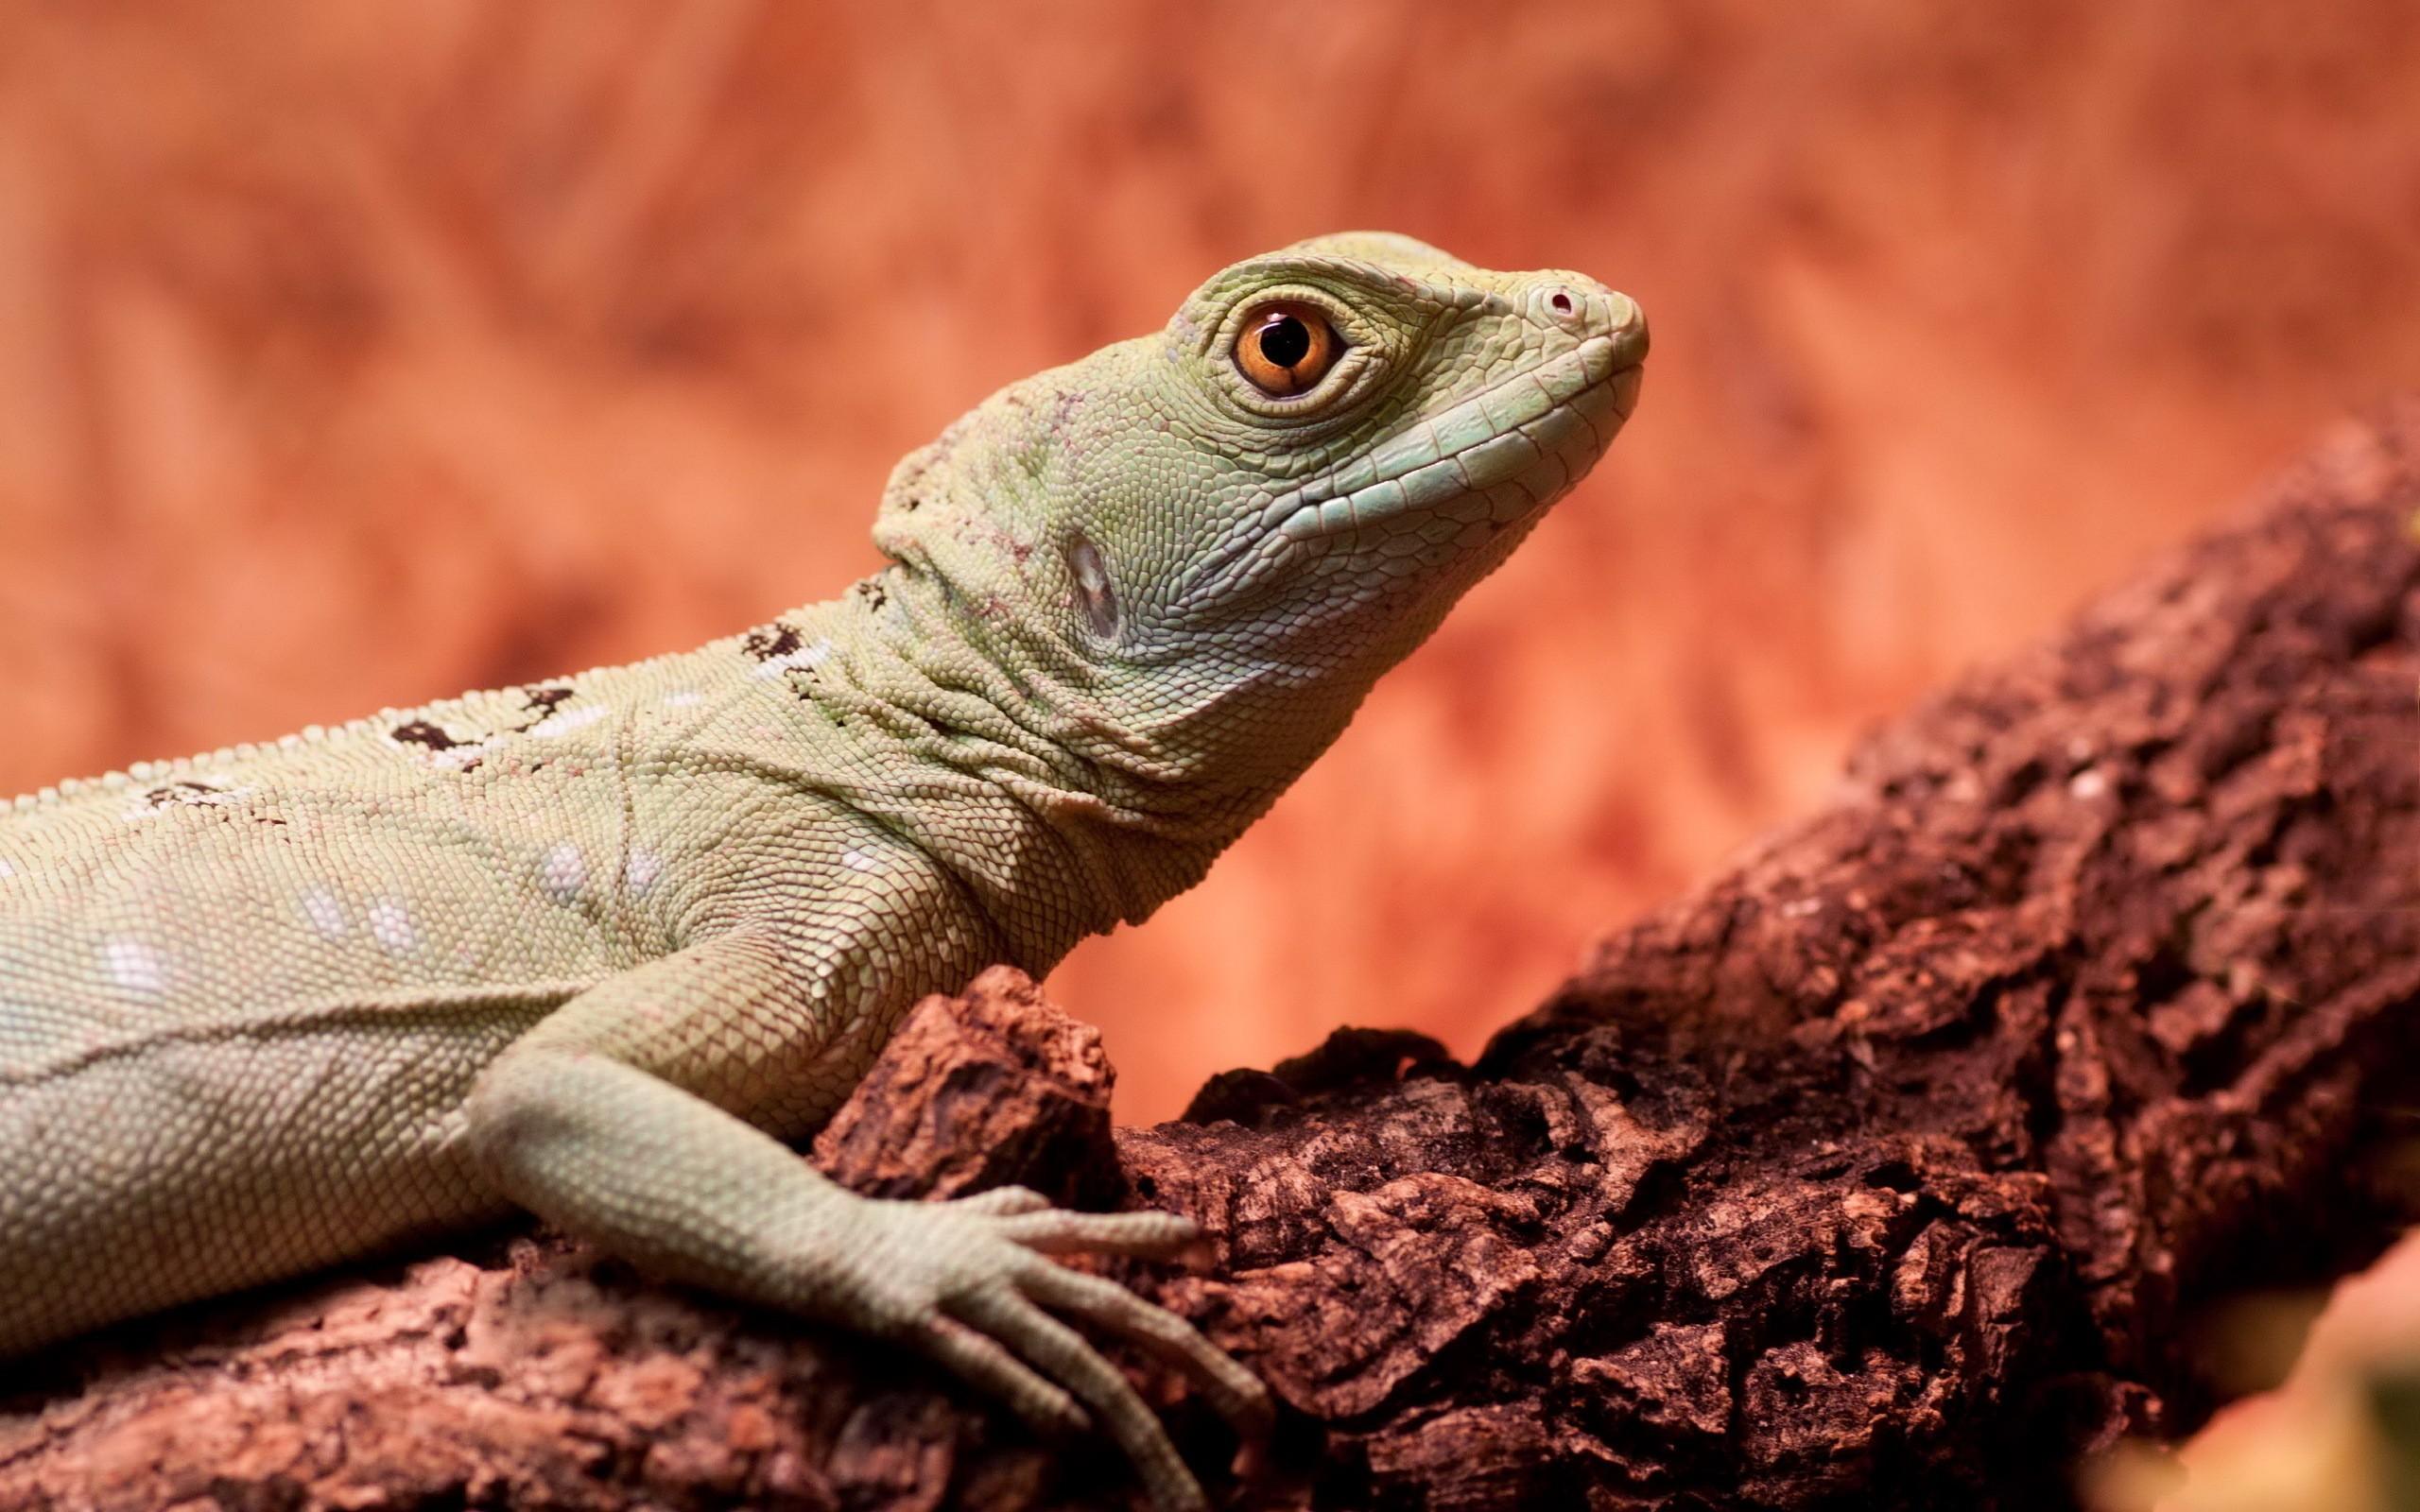 General 2560x1600 reptiles lizards branch